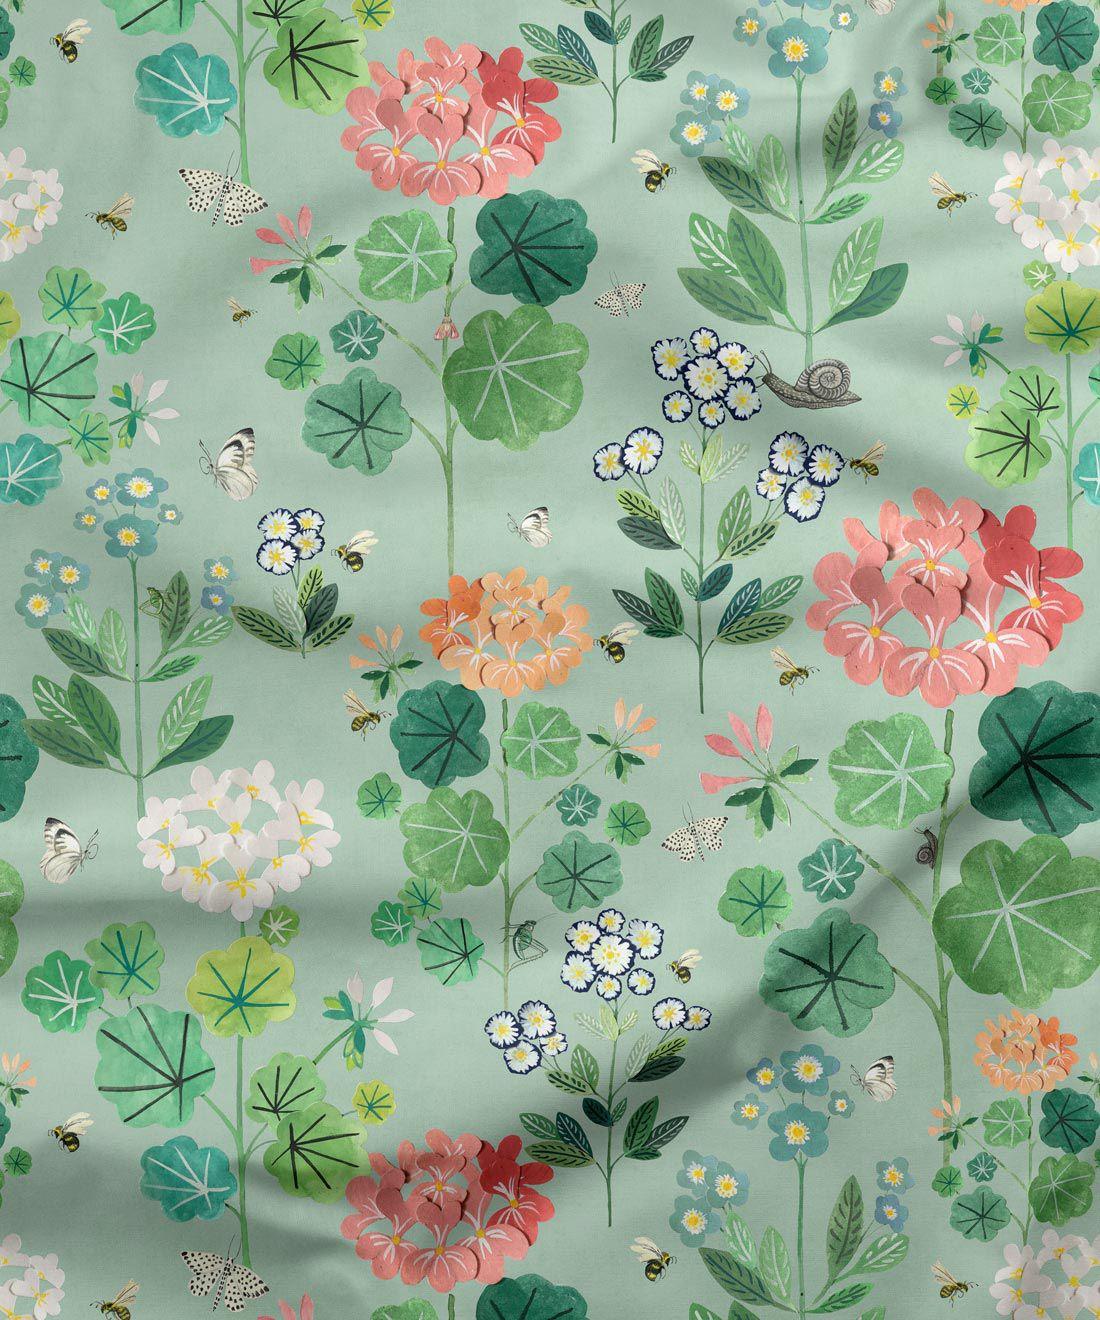 Sophie's Garden Fabric